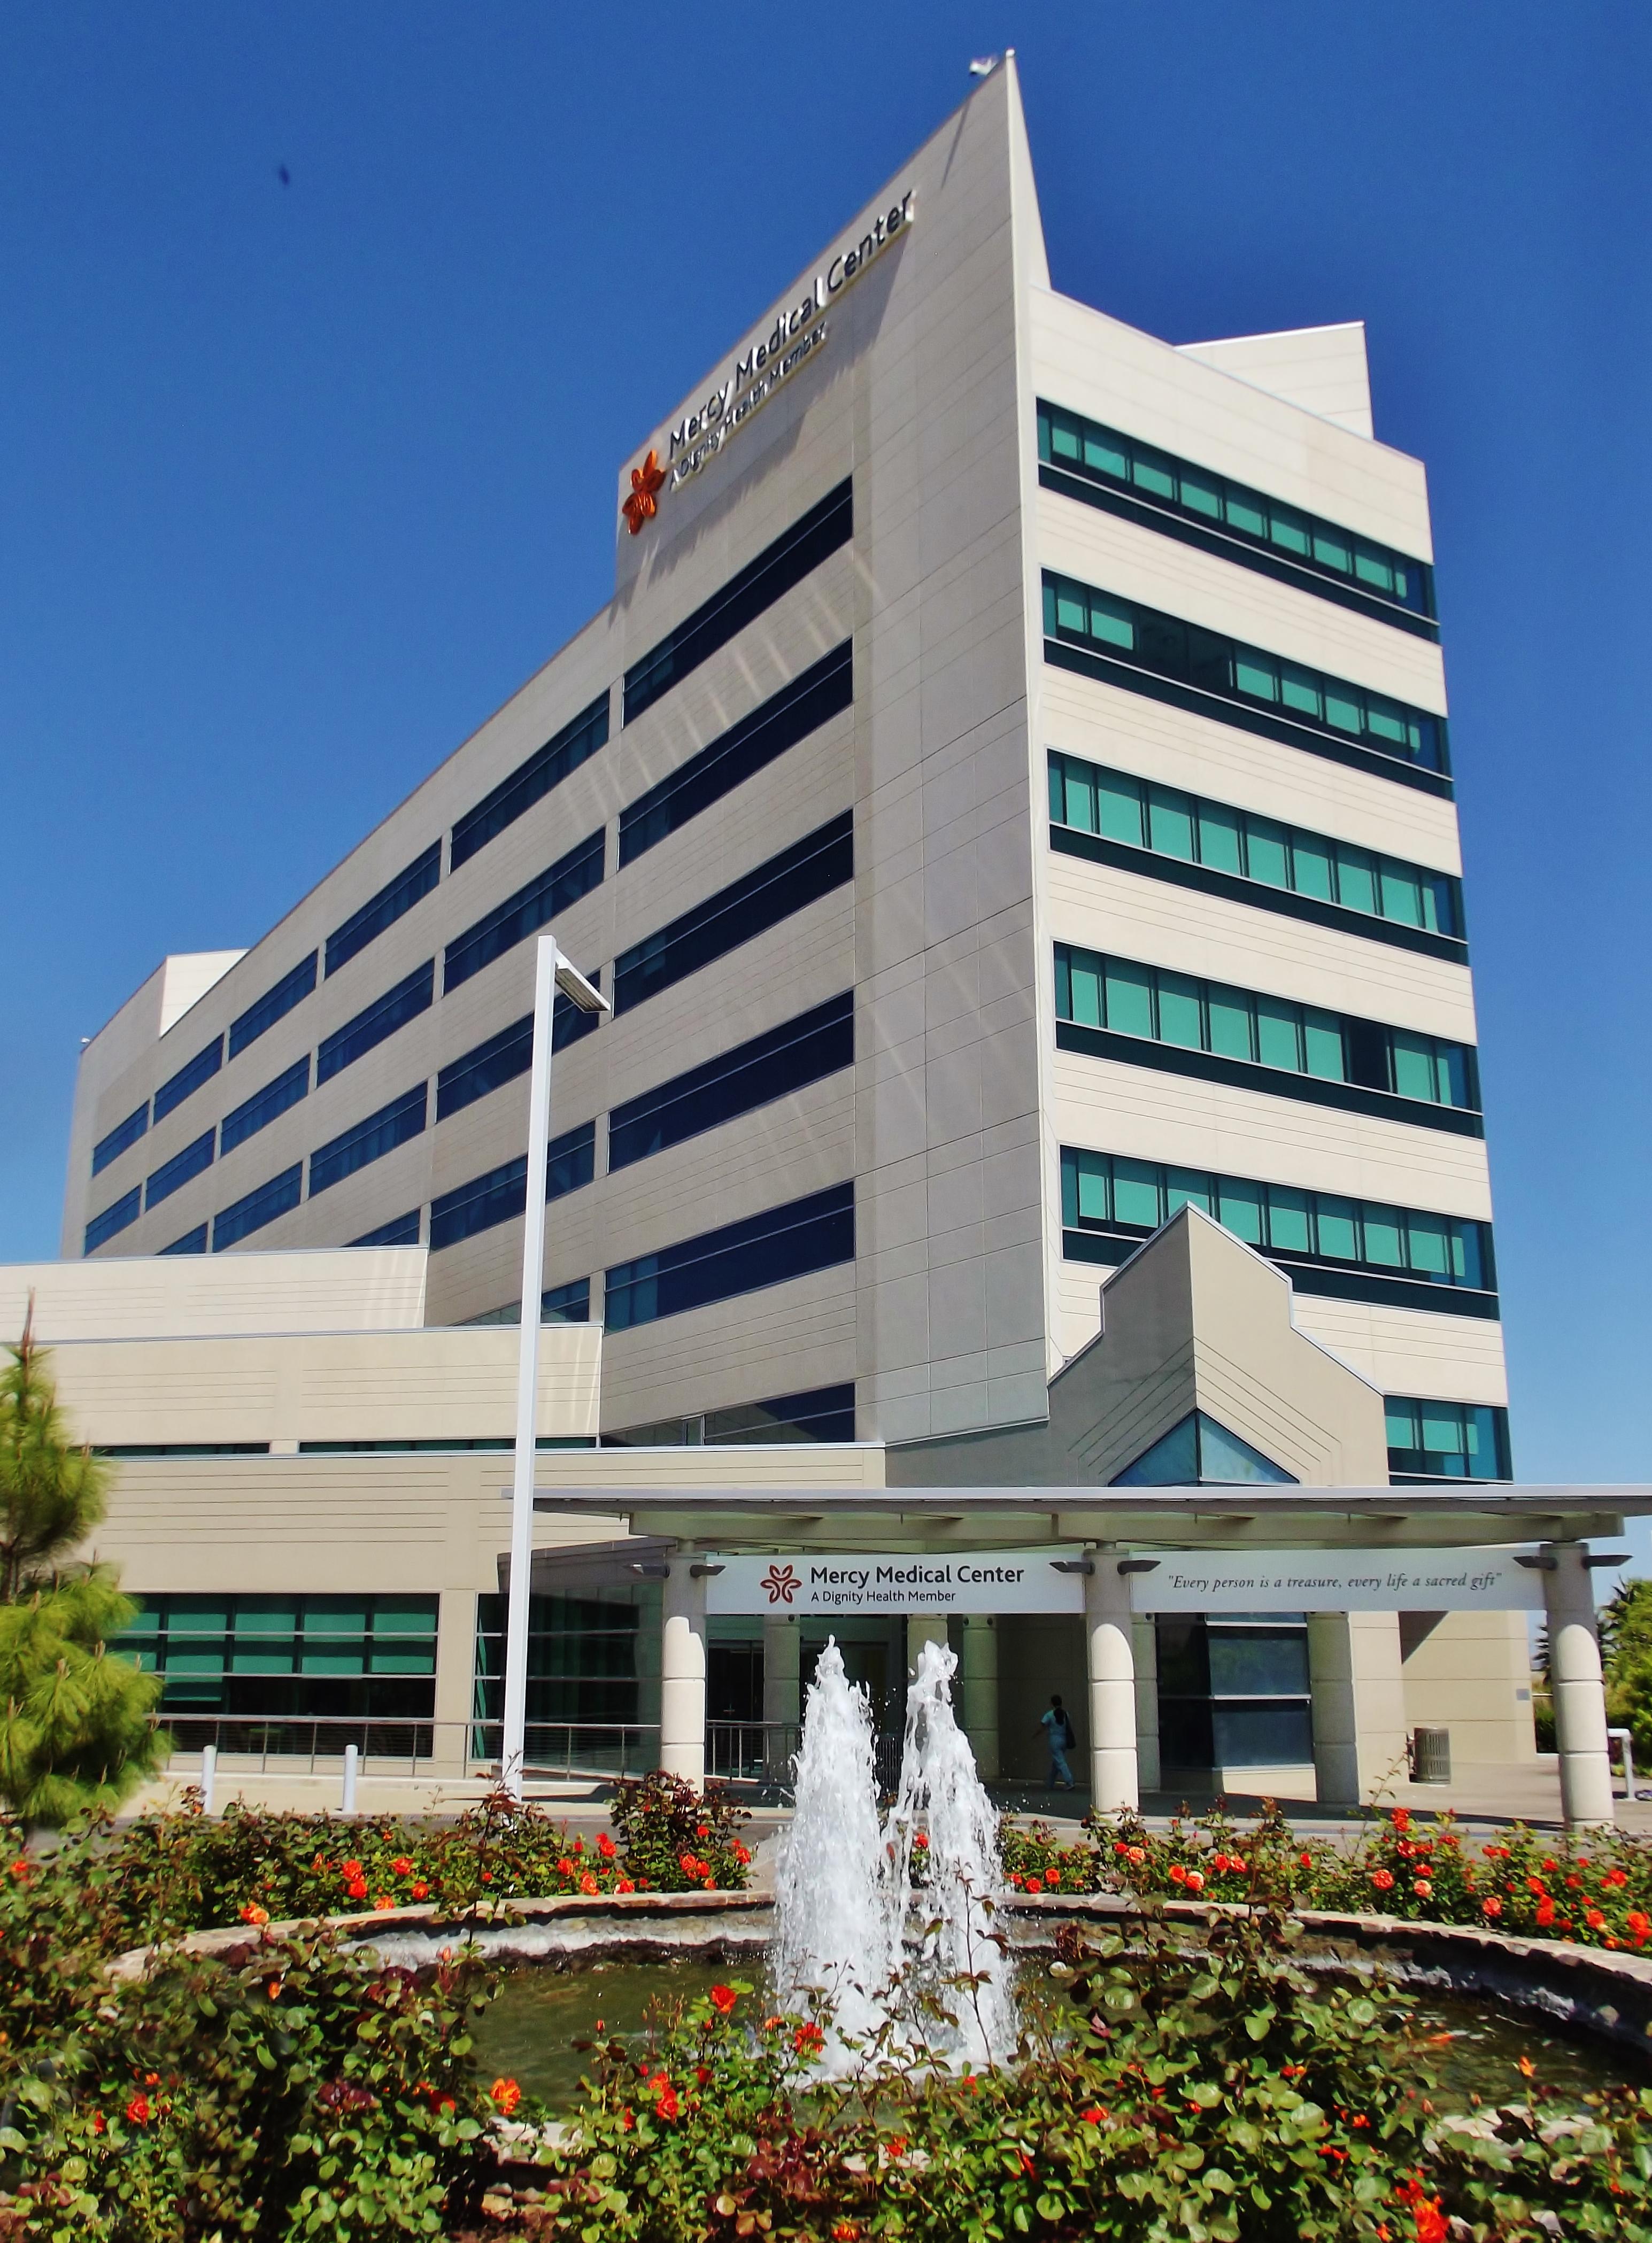 Mercy Medical Center Merced Wikipedia